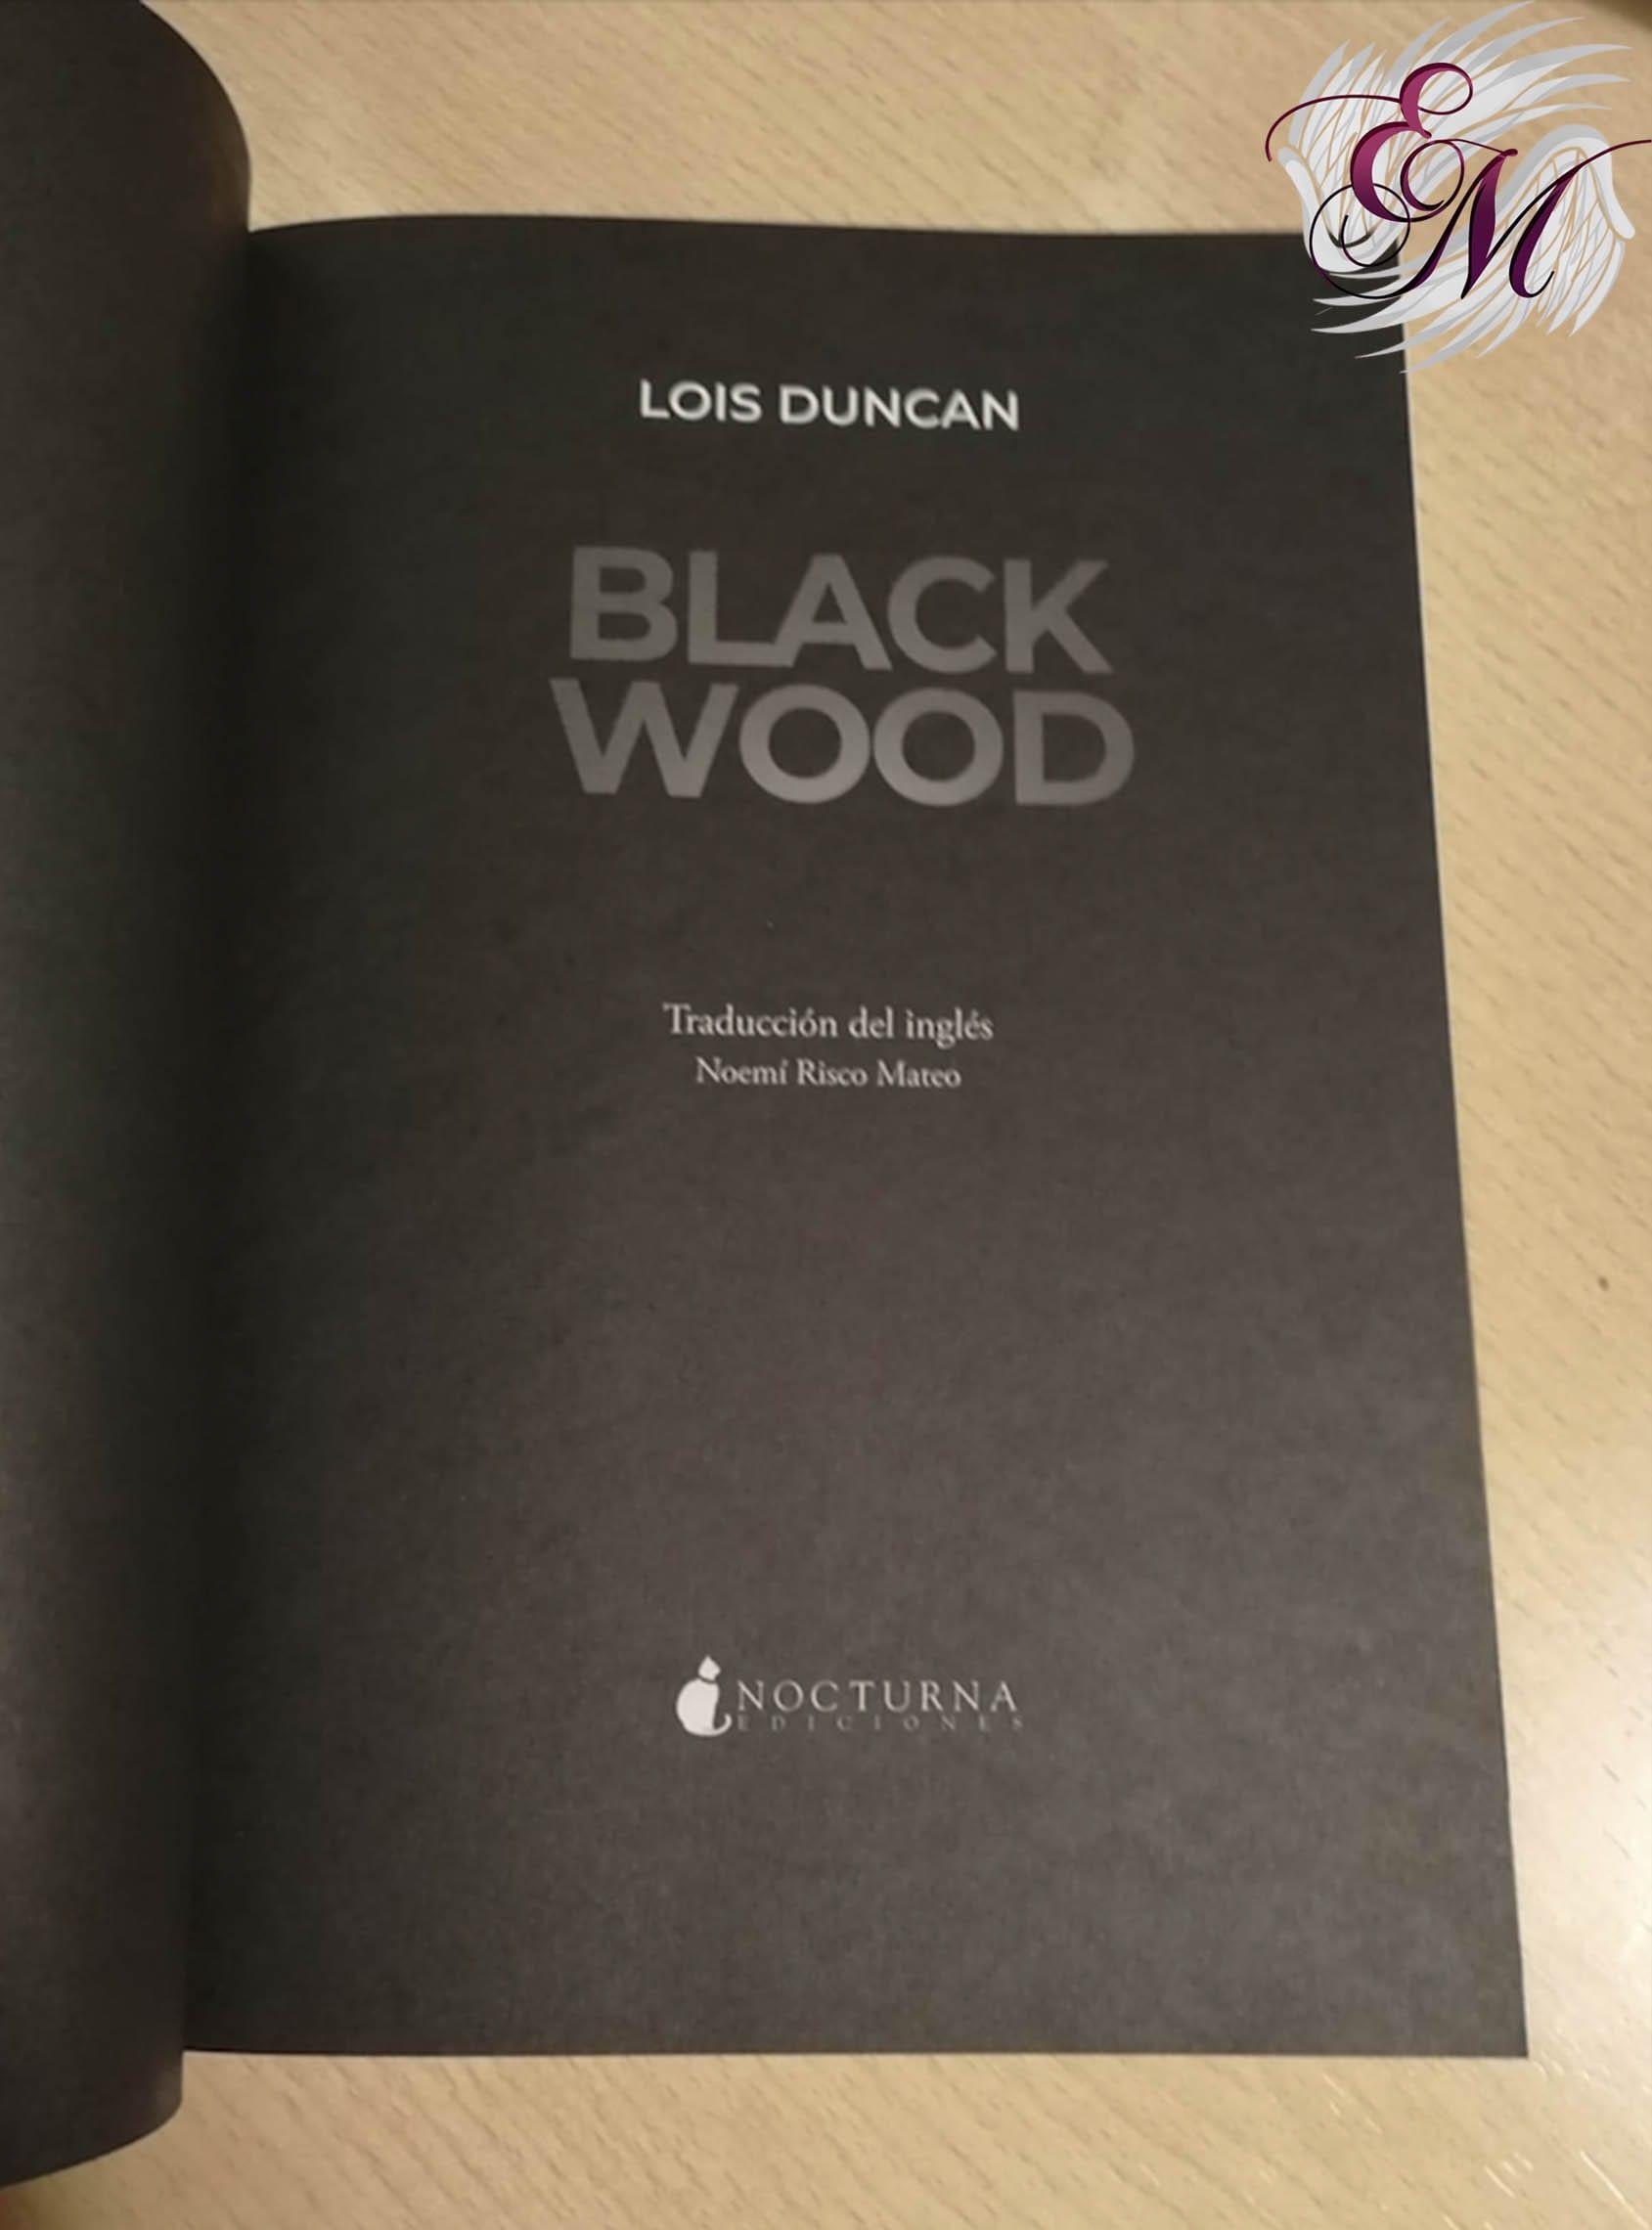 Blackwood, de Lois Duncan - Reseña